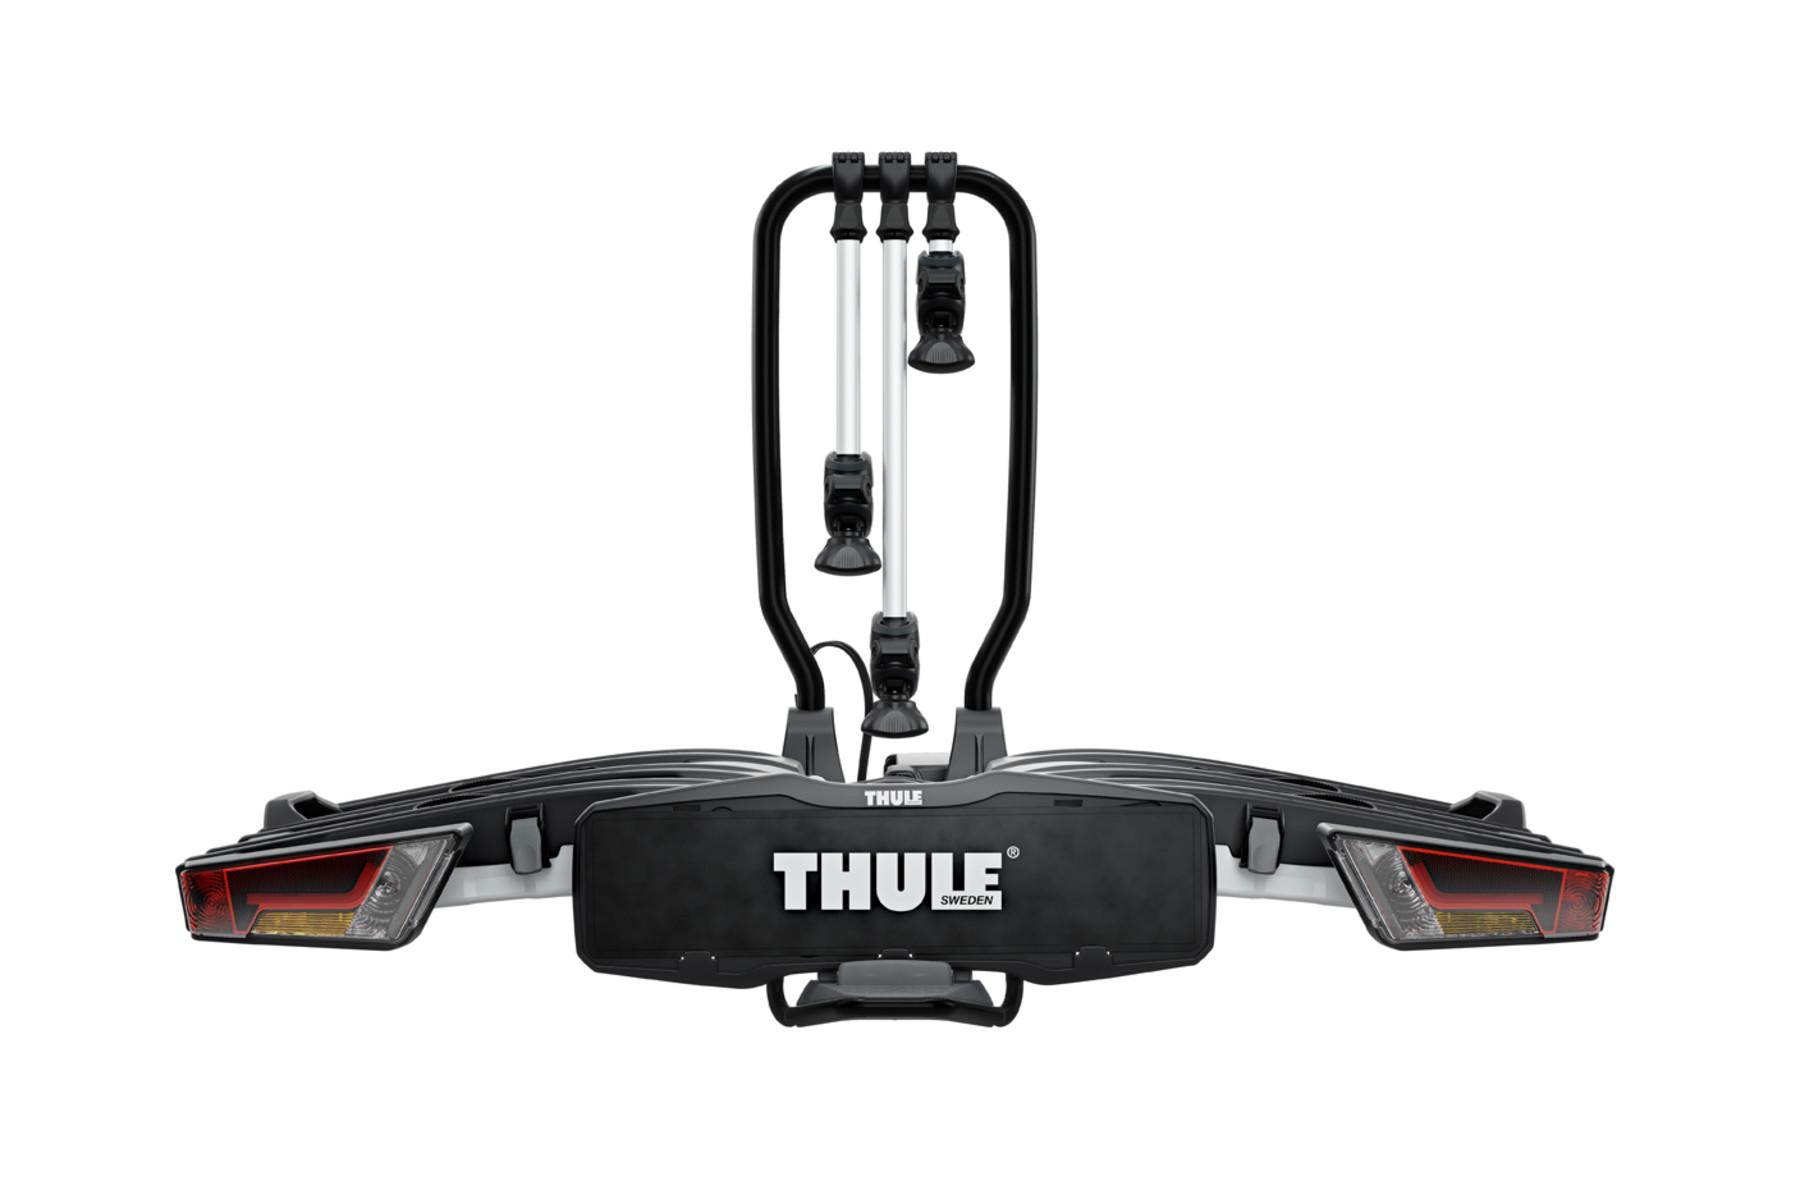 Transbike Suporte 3 Bikes Engate Thule Easyfold Xt 934 BRINDE